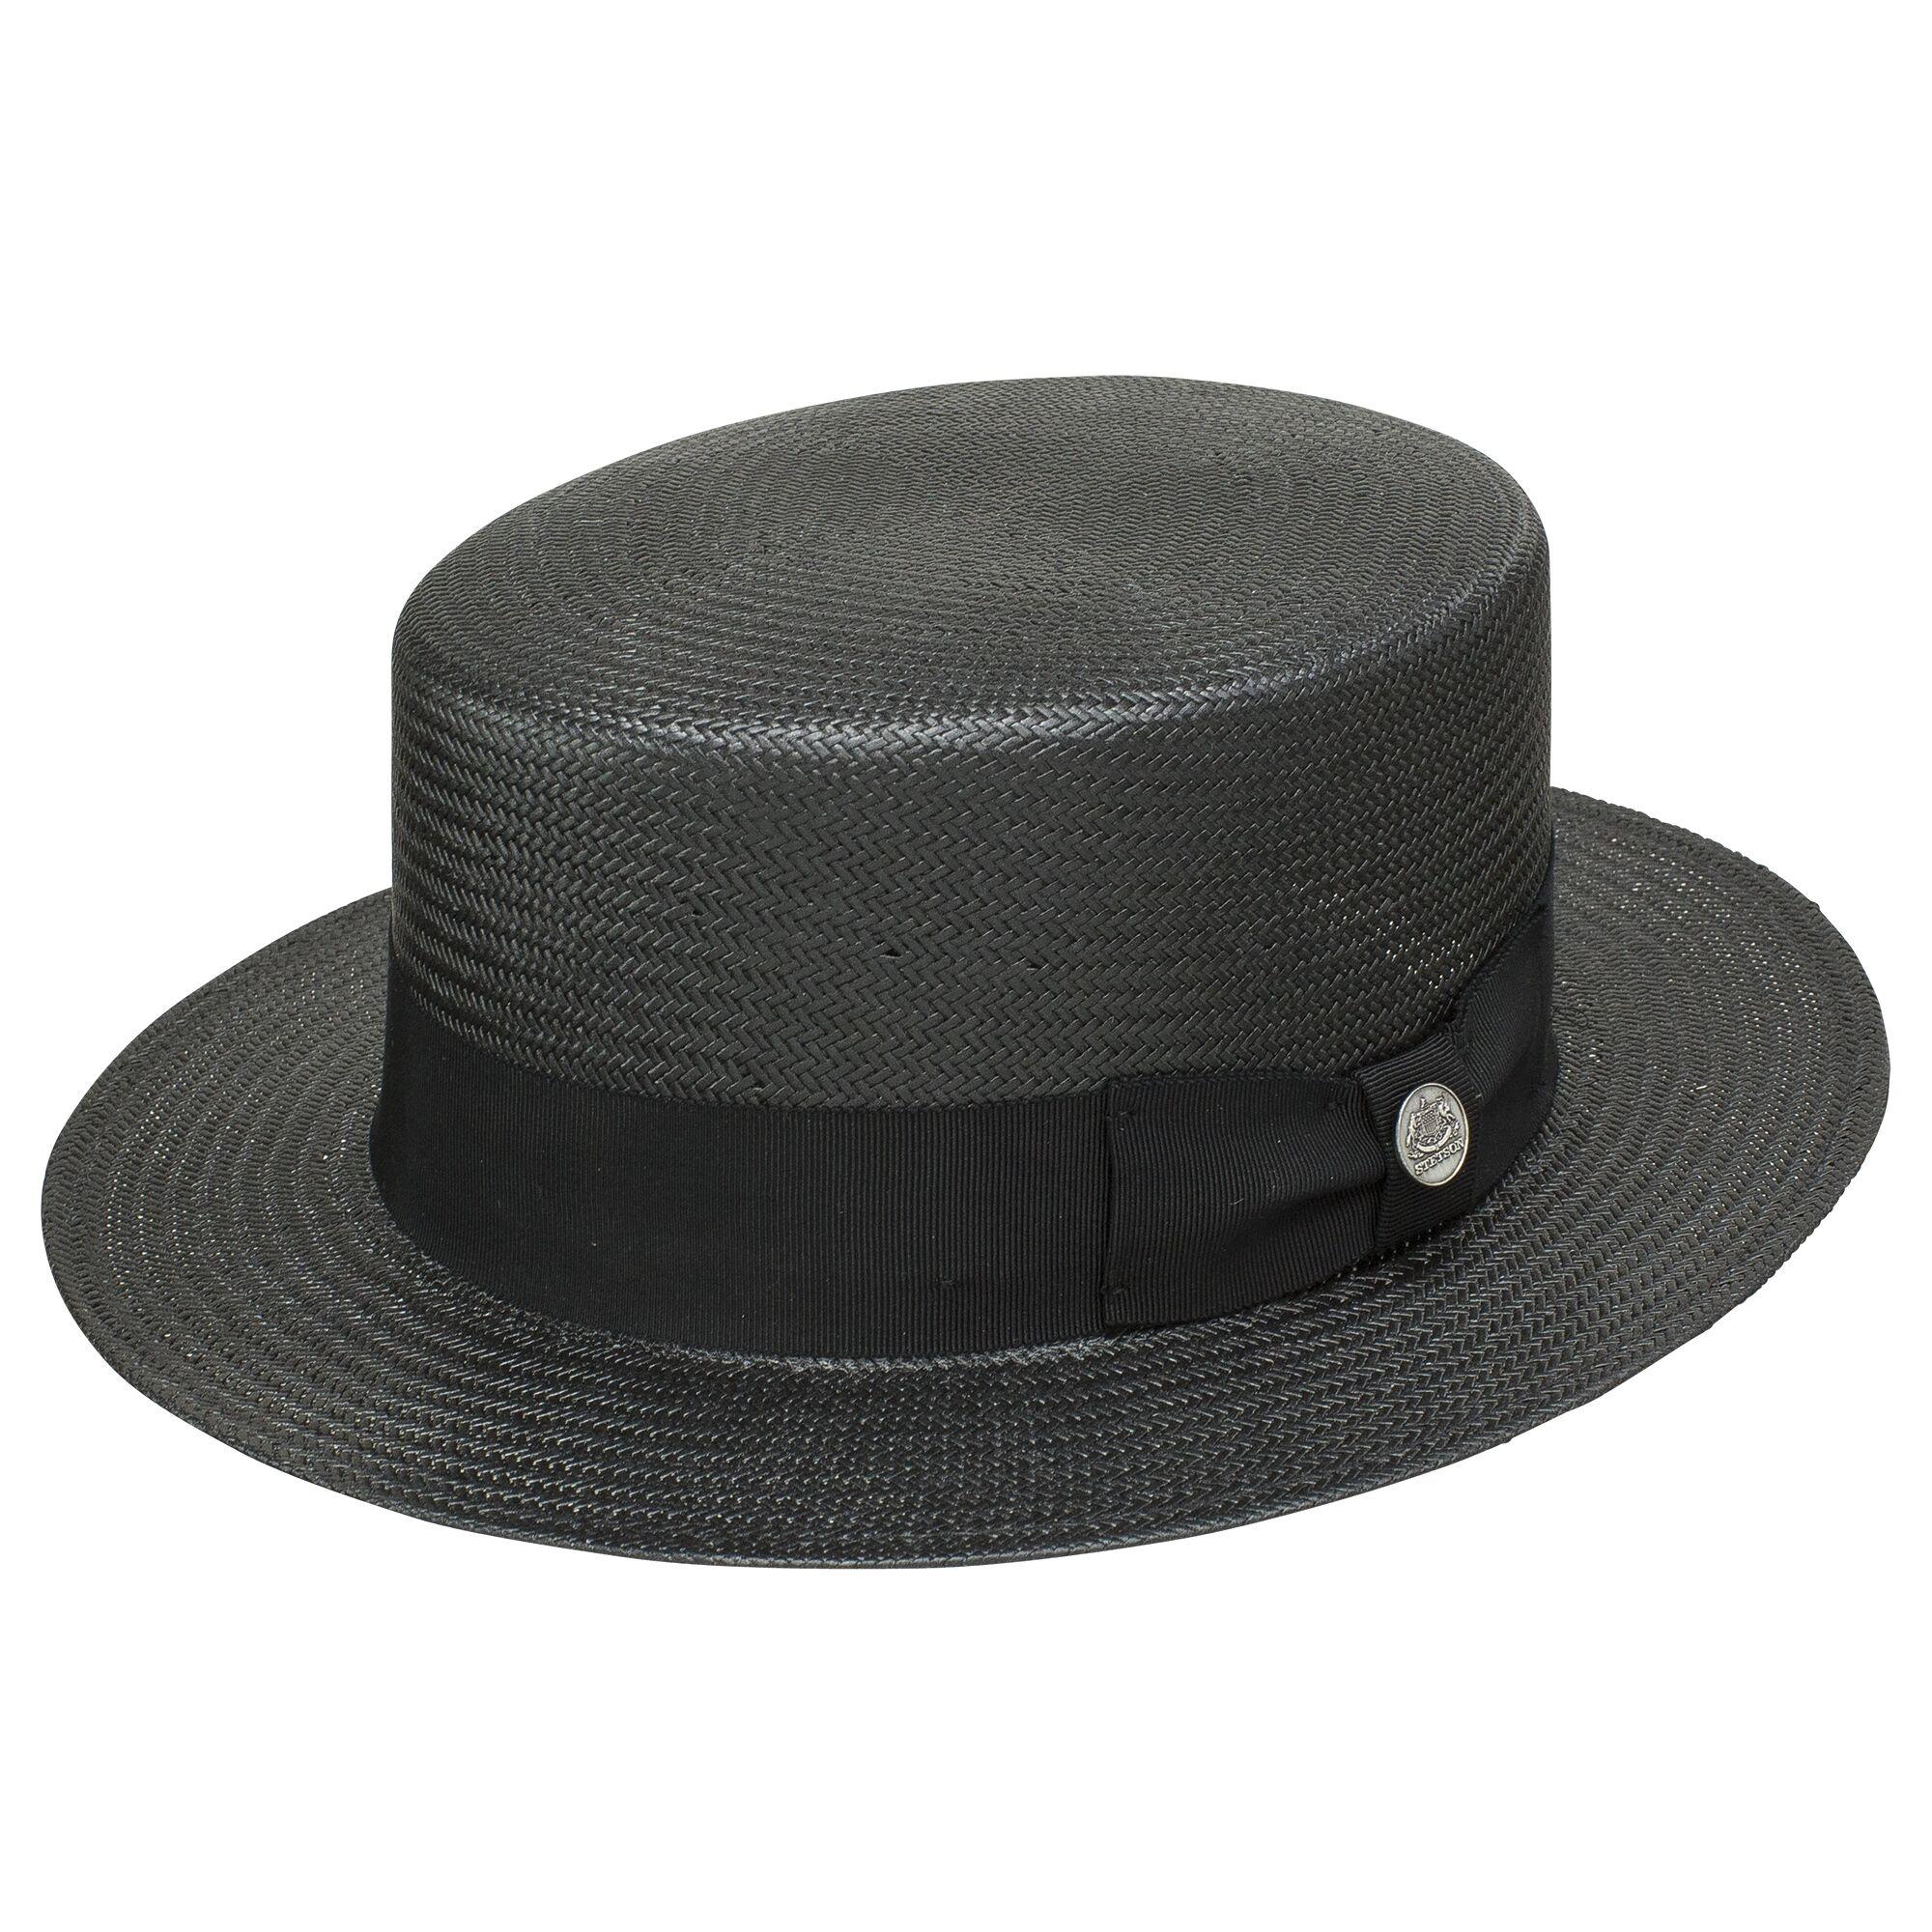 Stetson Keeneland - Straw Fedora Hat (Closeout)